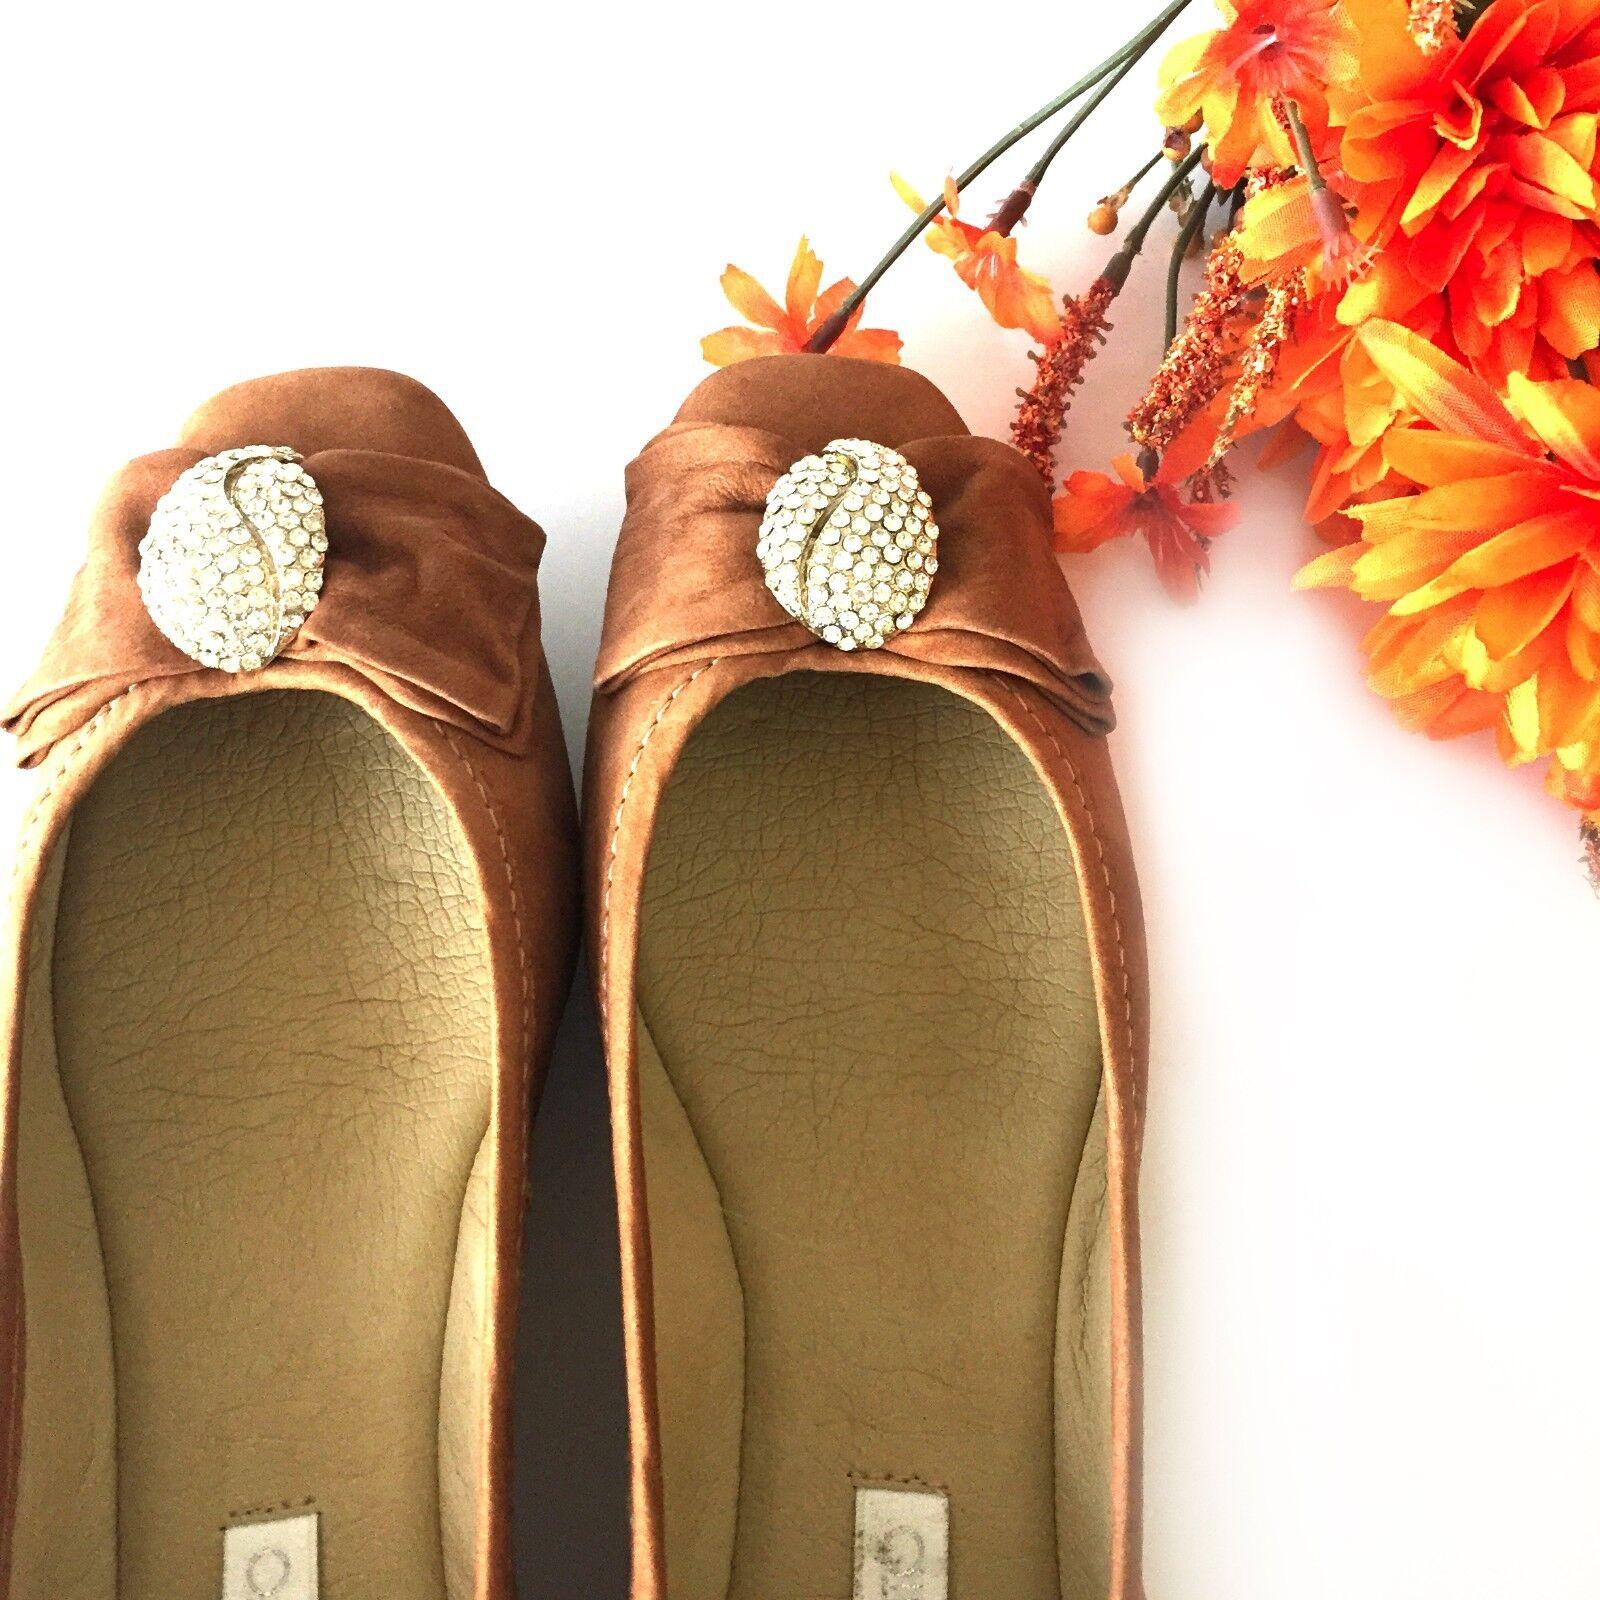 Leather Ballet Flats scarpe Camel Nobuck Cowhide Brazil Comfortable Crystal